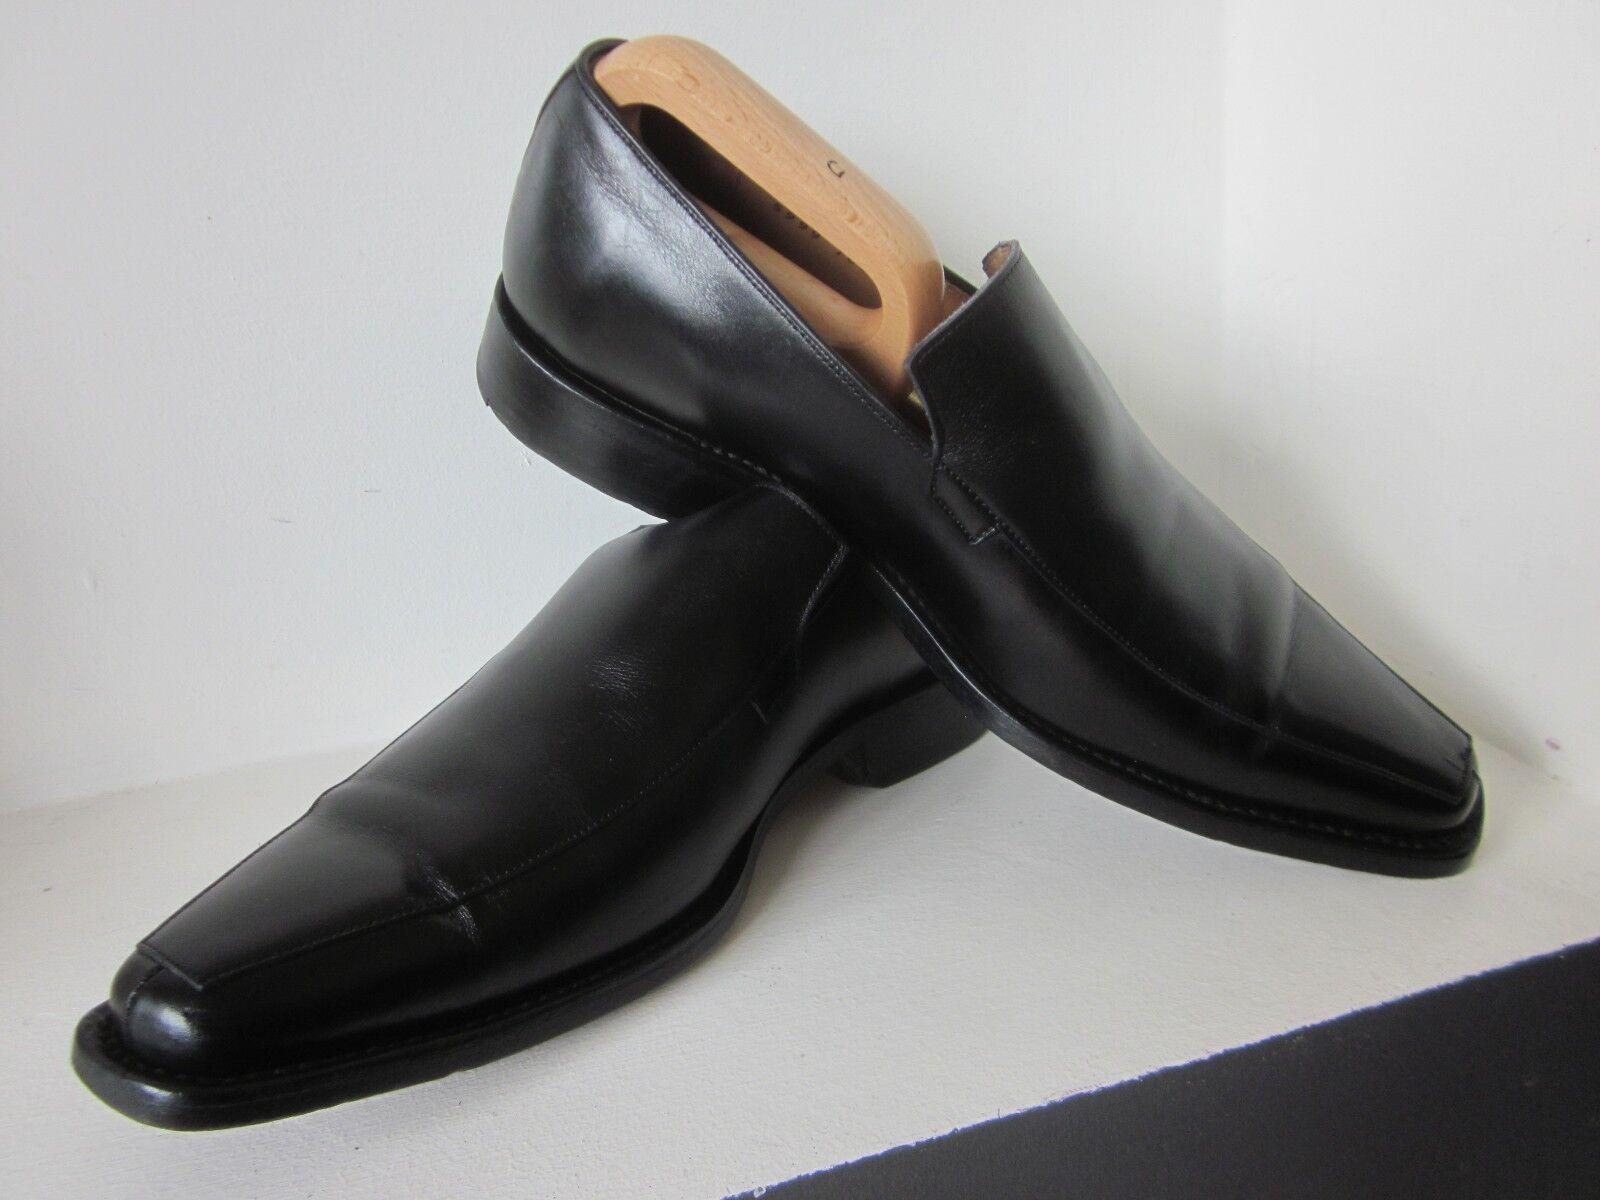 £395 GARY ANDERSON SAVILE ROW SHOES (7.5/eu41) BLACK LEATHER SLIP-ON 5999-7833-4